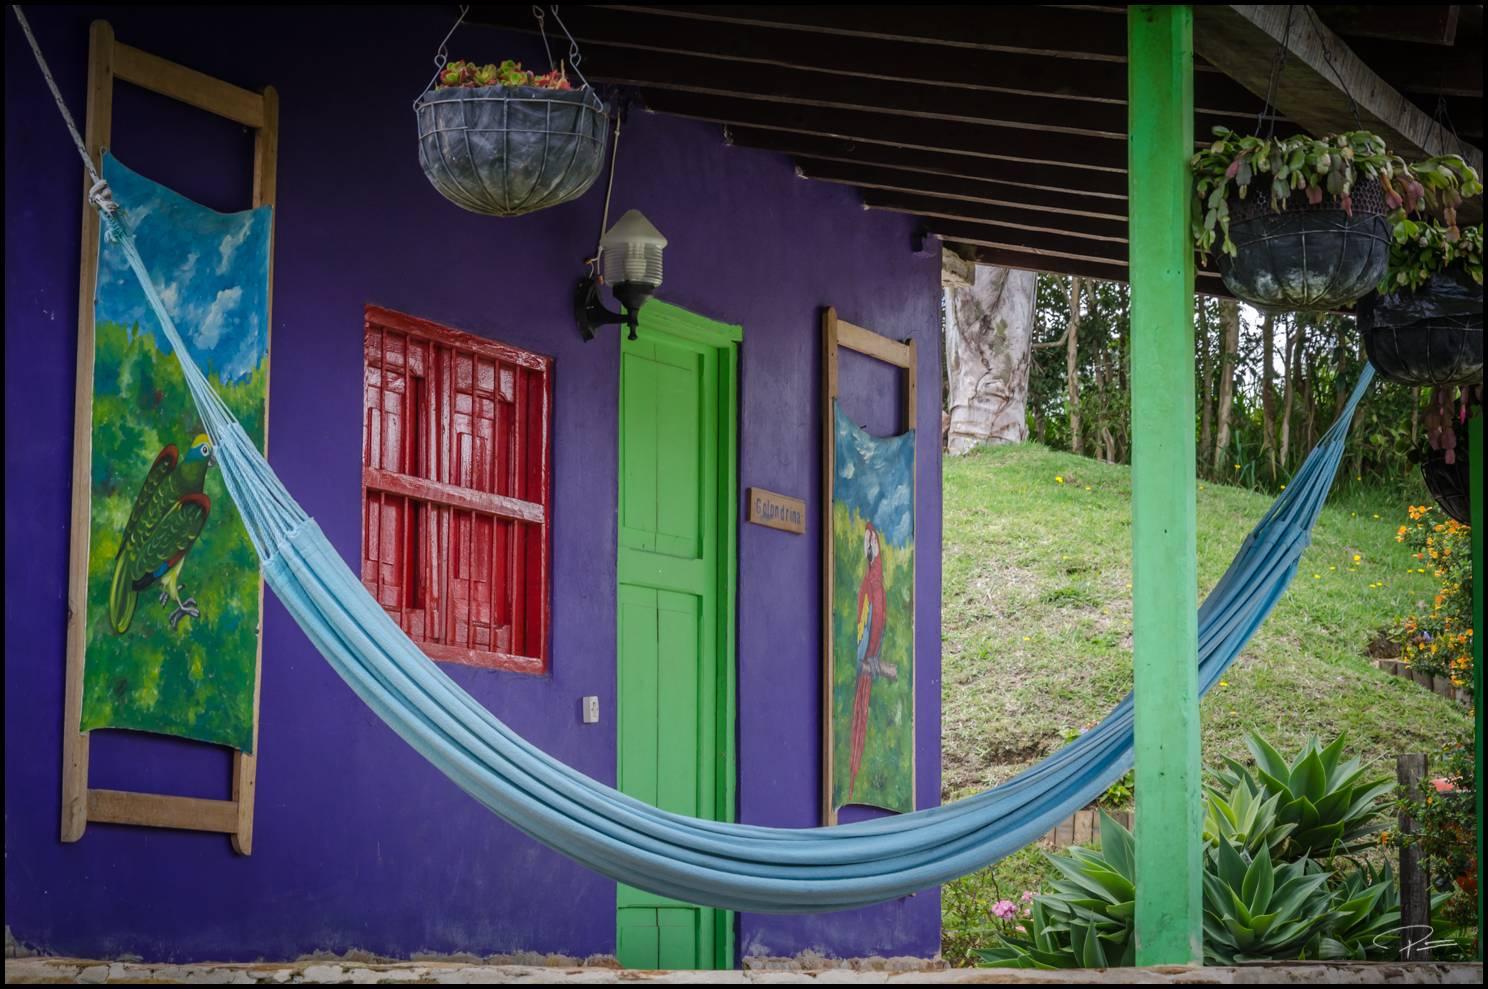 Medellin MontanaMagica 09Oct2013 PG 015